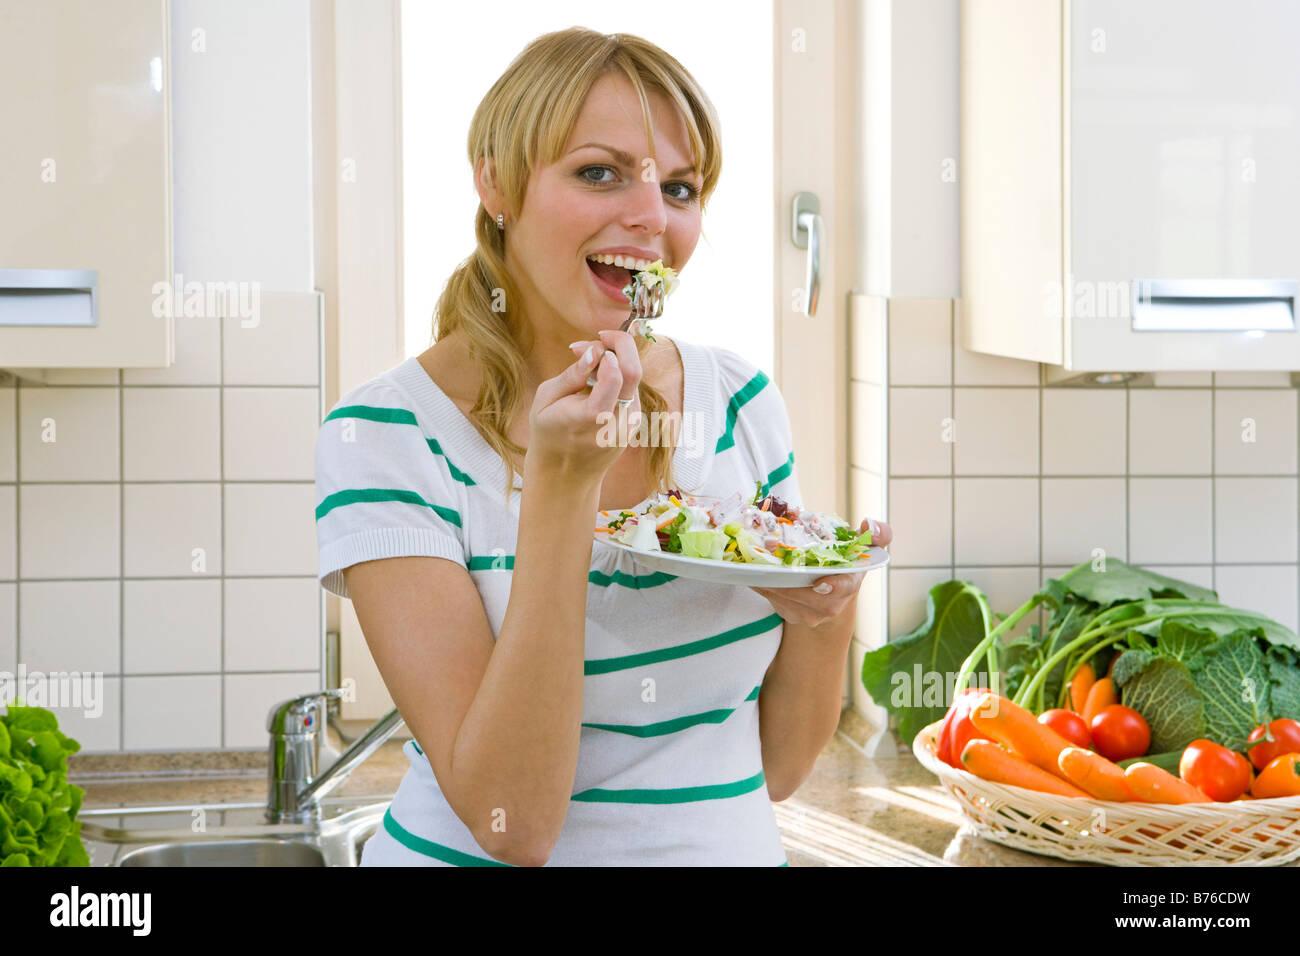 Frau isst Salat, woman eating salad - Stock Image